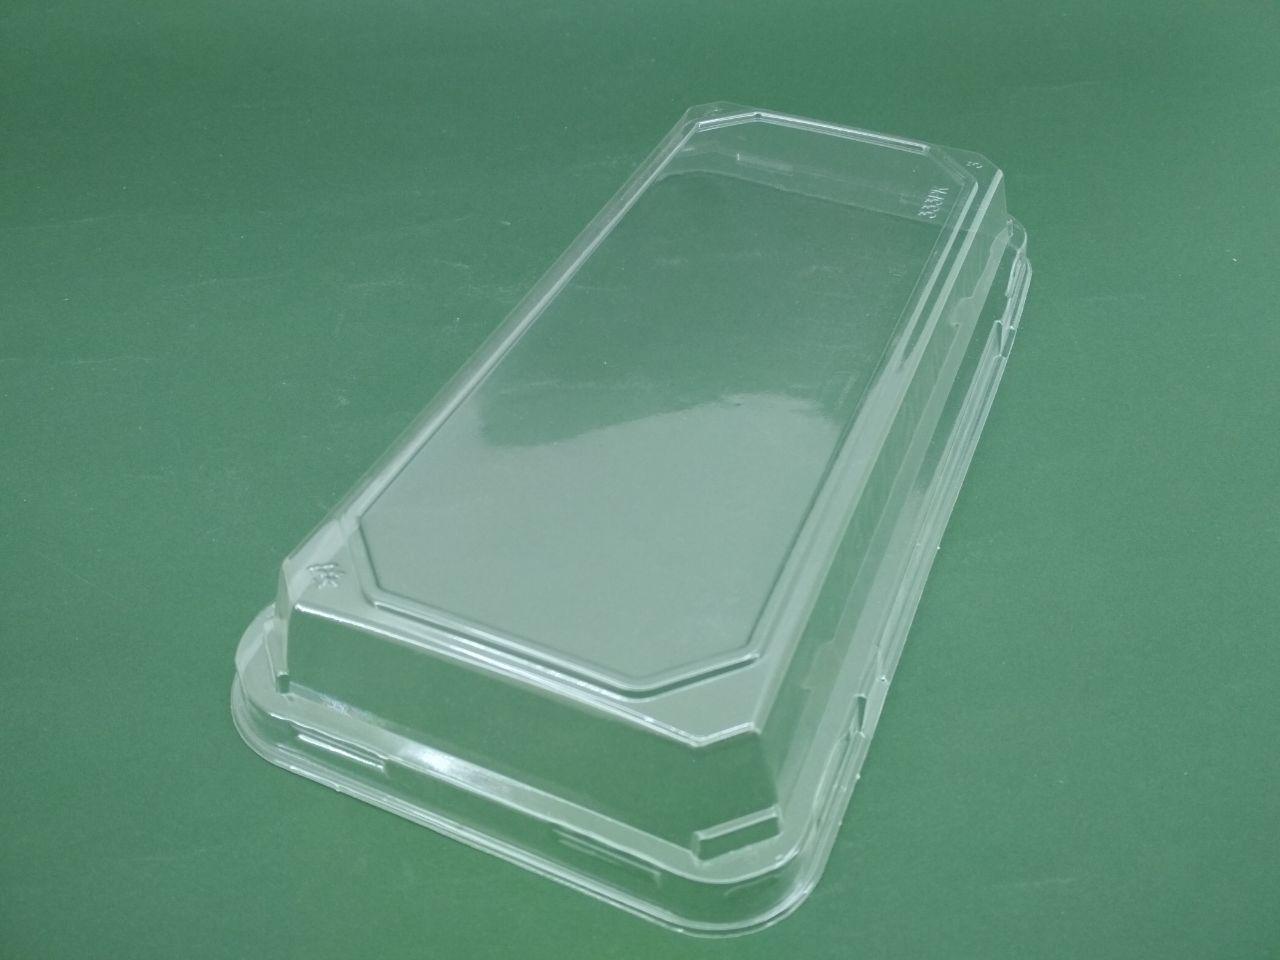 Крышка пластиковая SL333PK под контейнер для суши 333BL, (24,3/11/1,7), 50 шт/пач